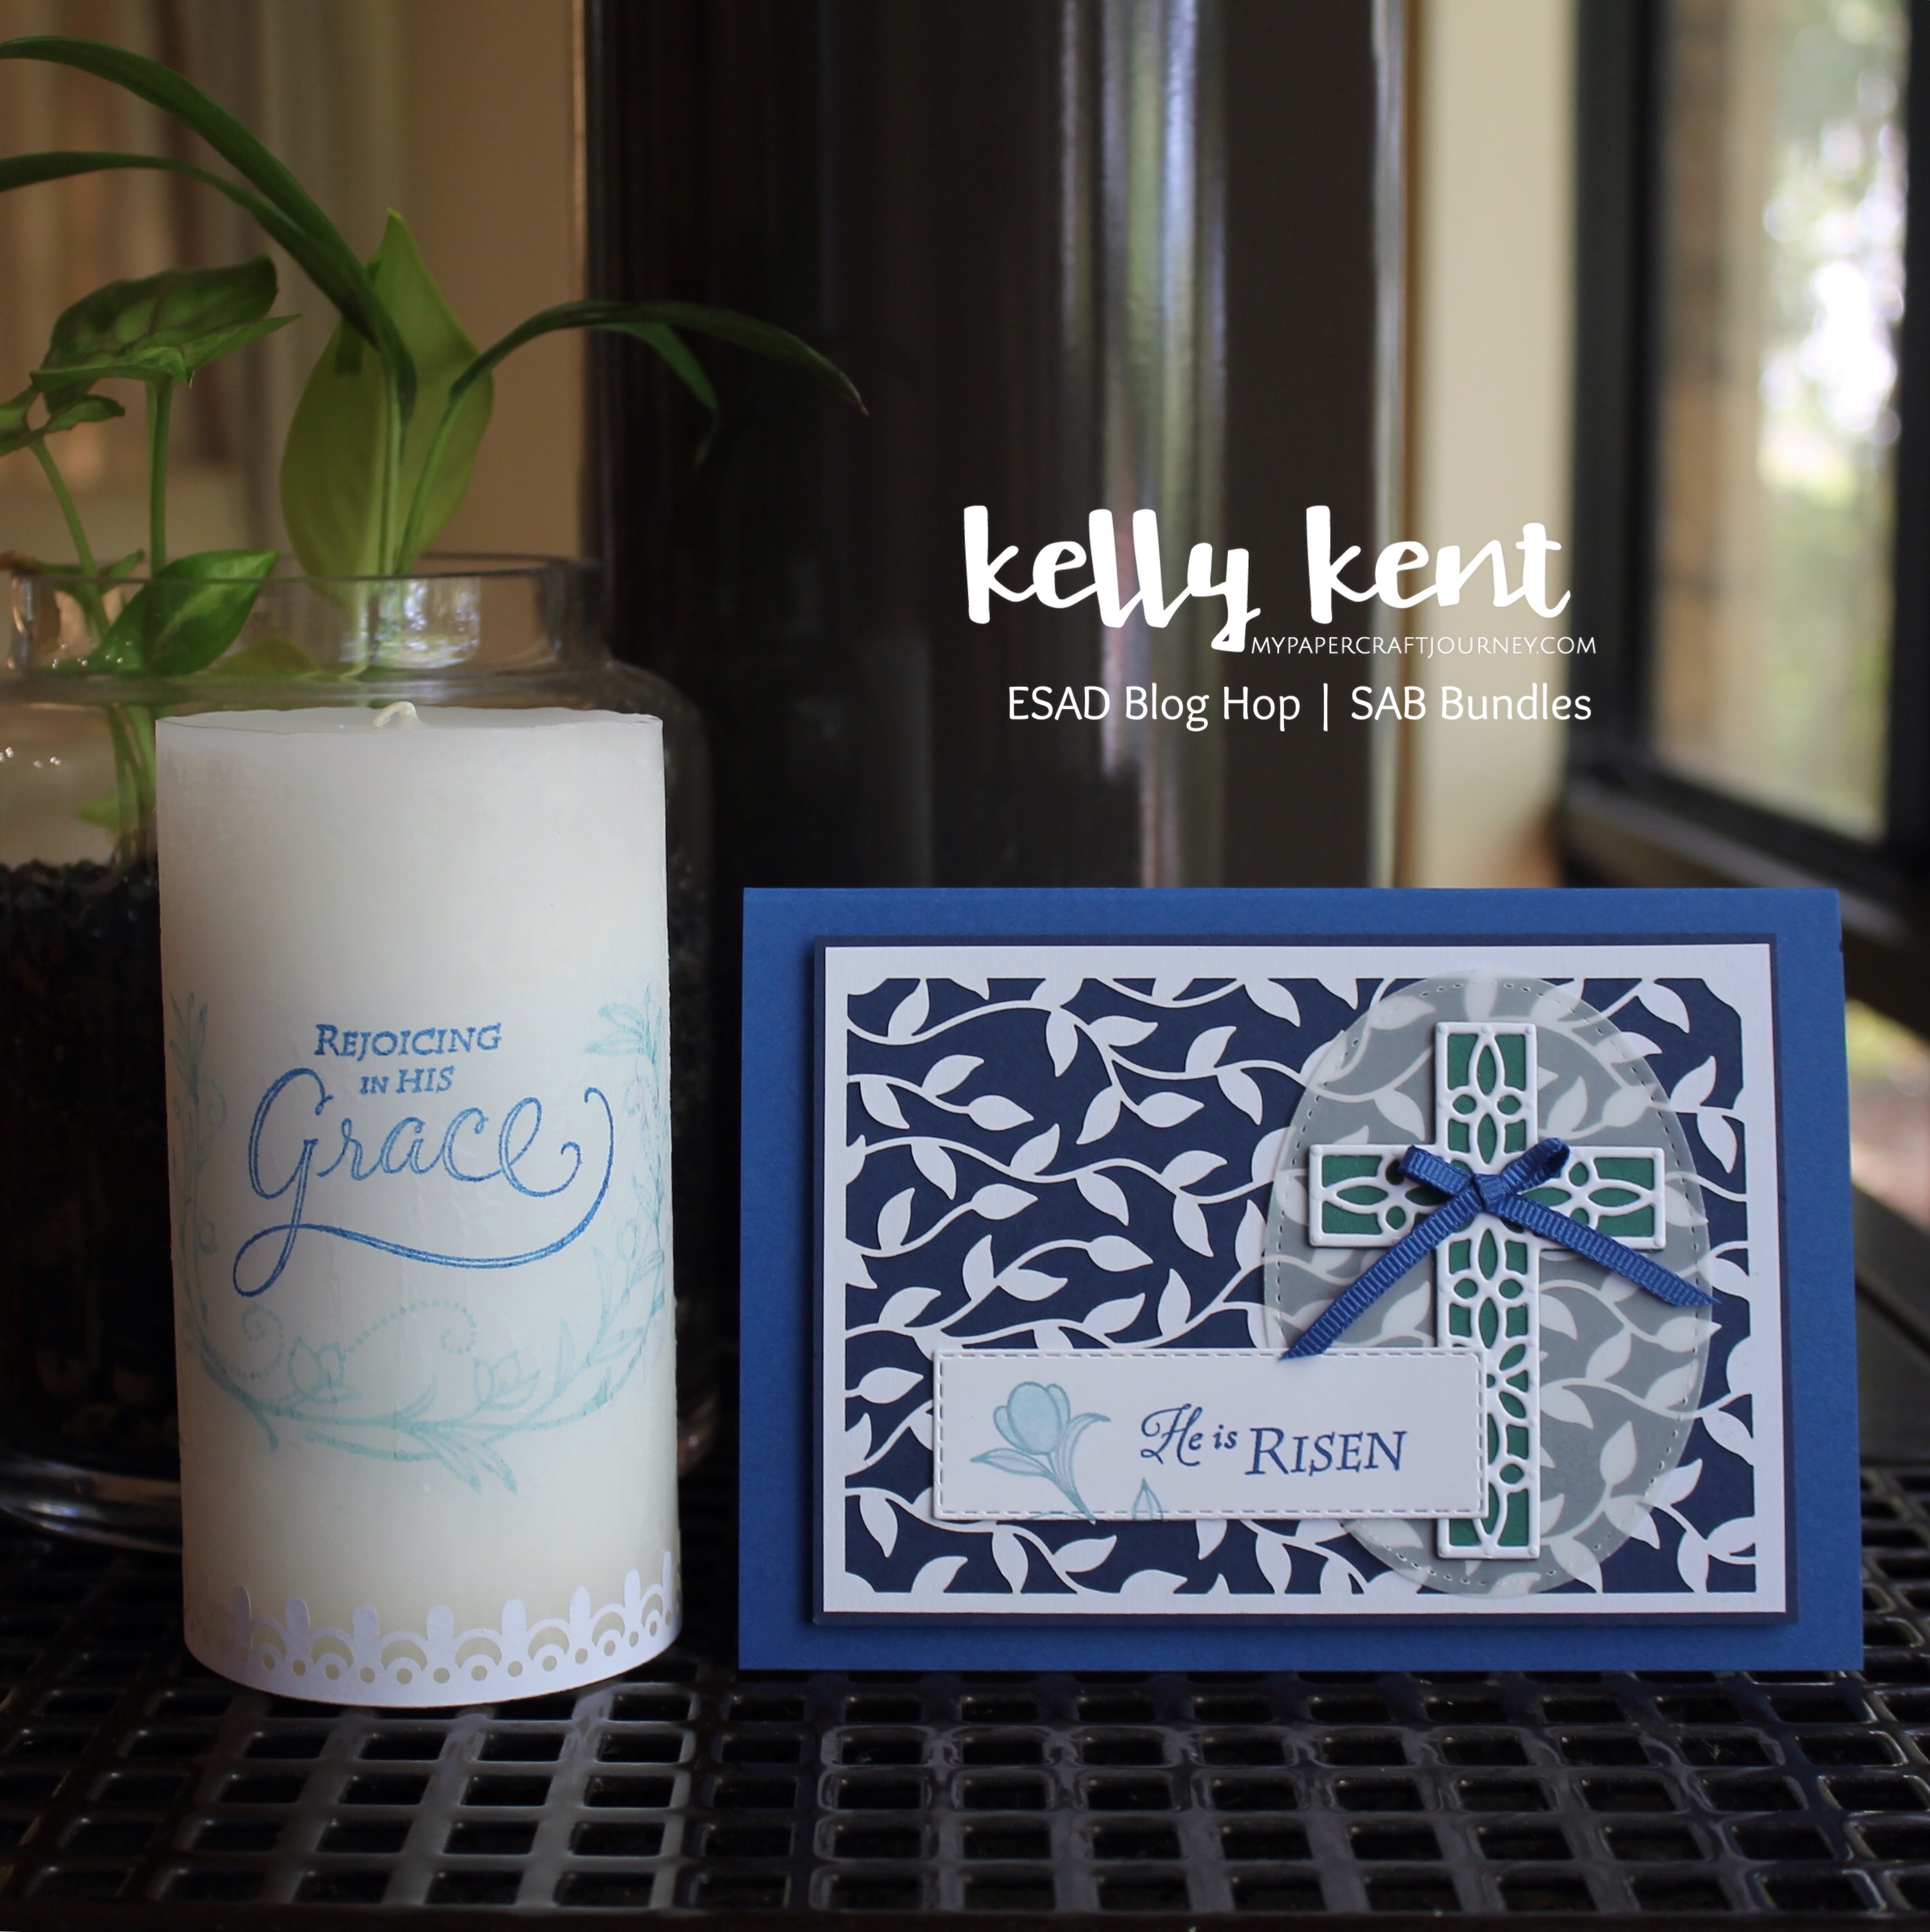 His Grace SAB Bundle | kelly kent